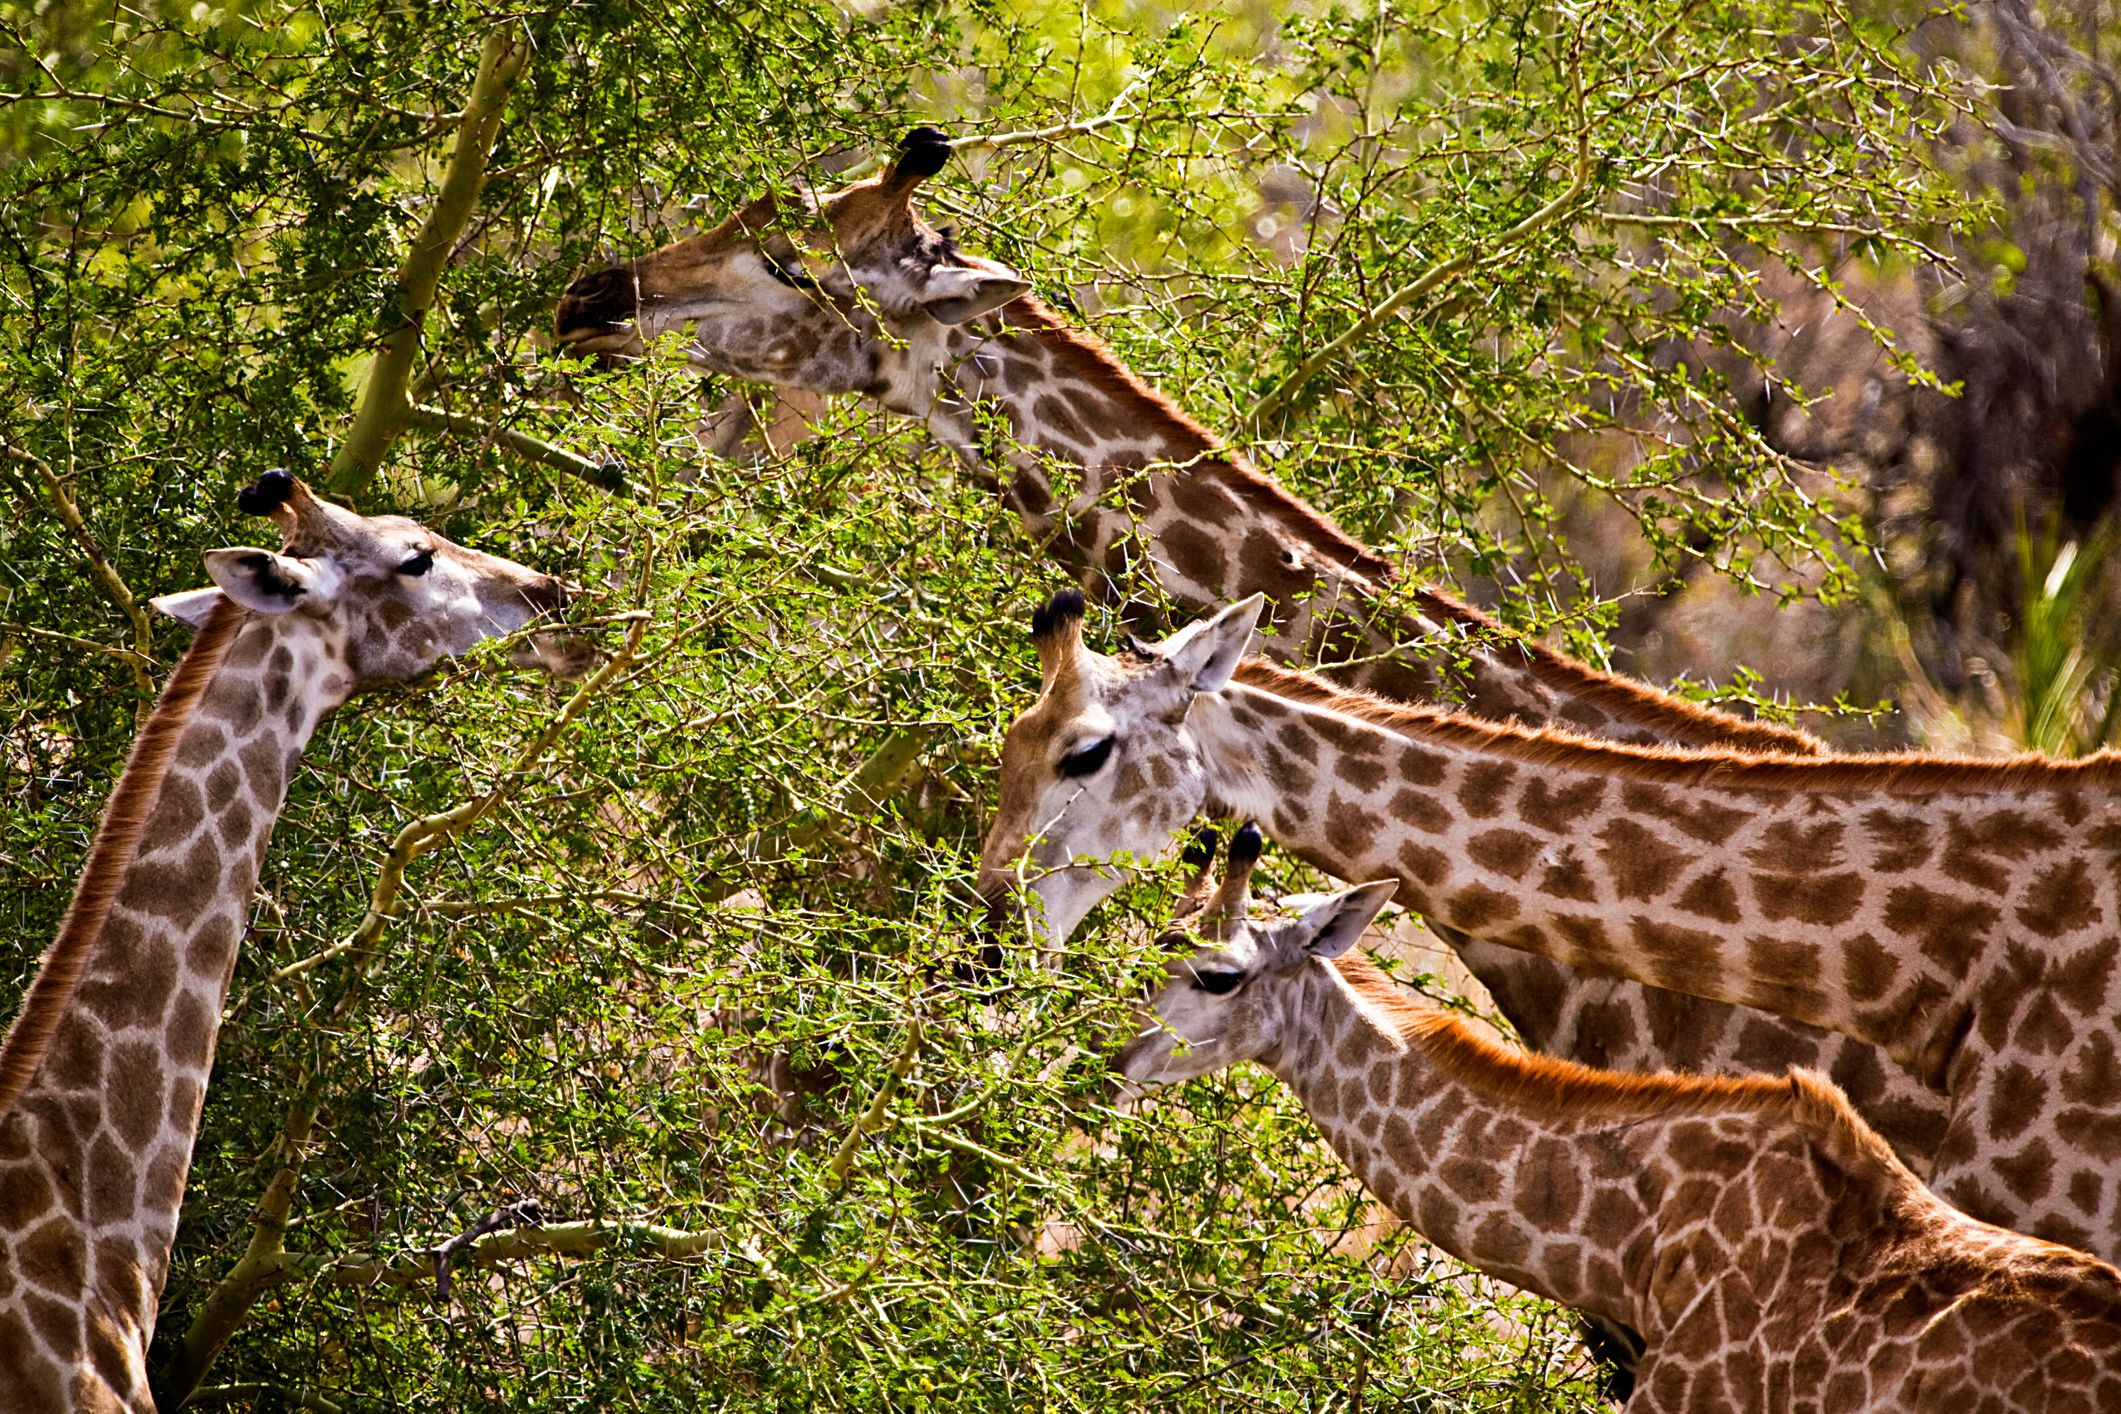 4 grazing giraffes